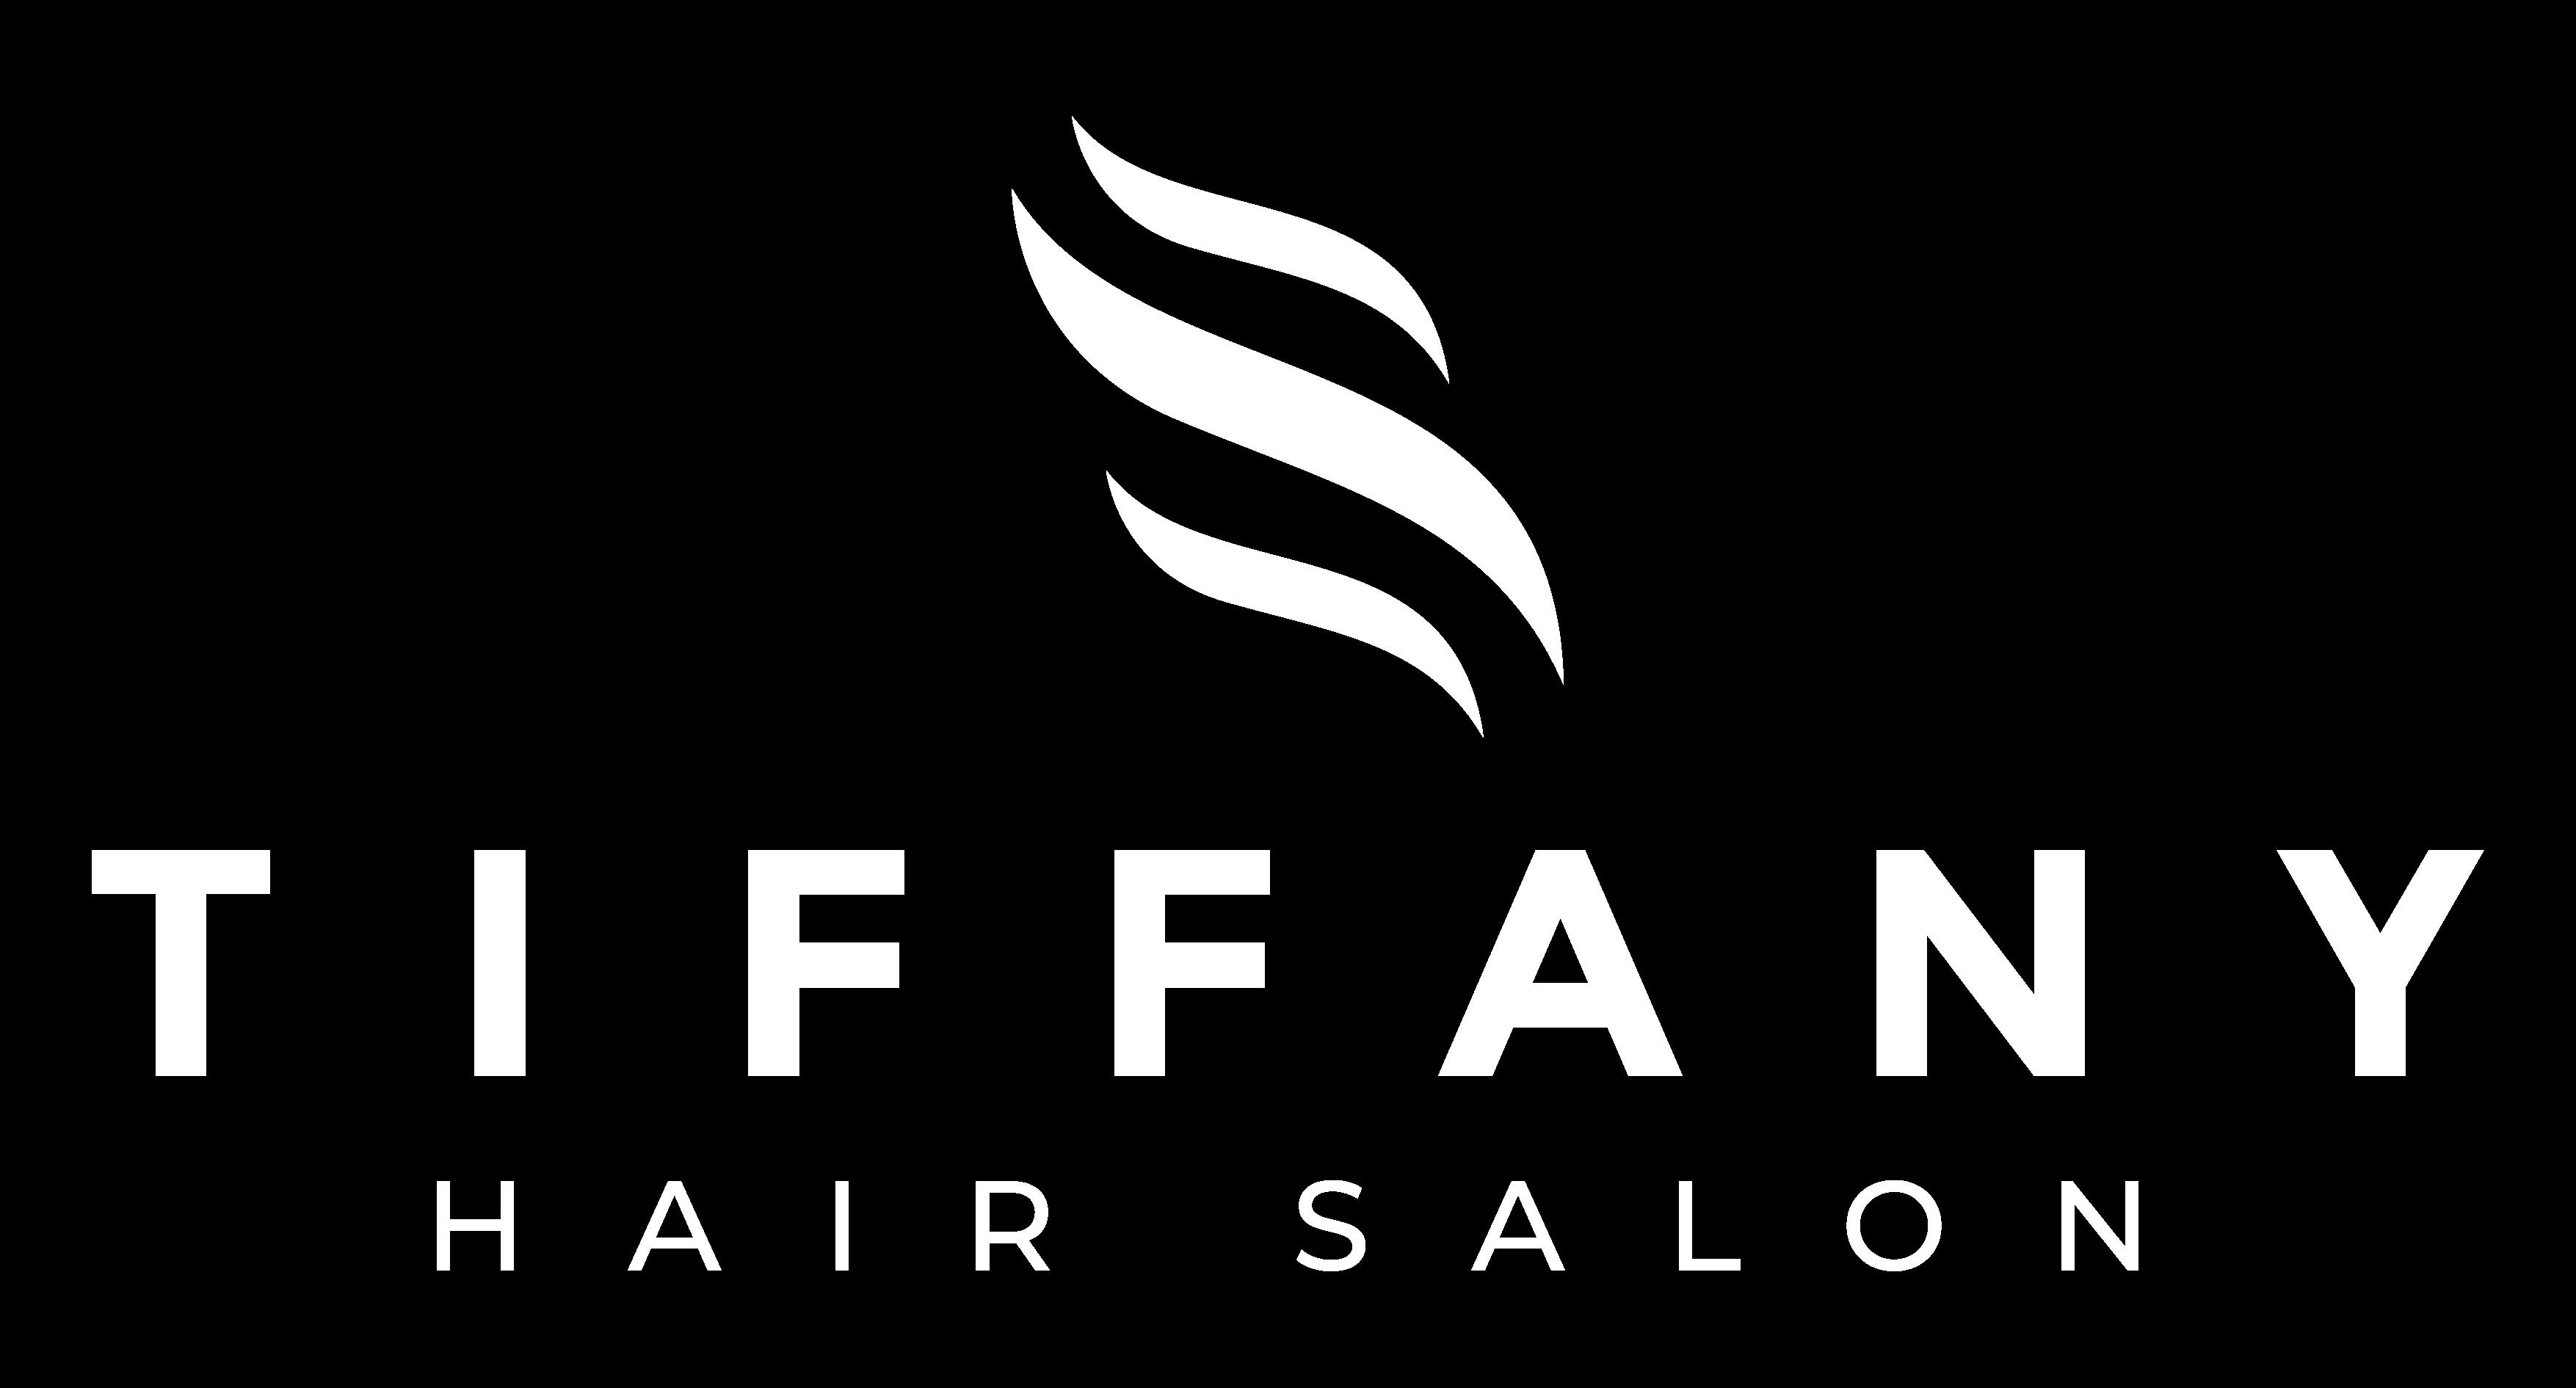 Tiffany Hair Salon